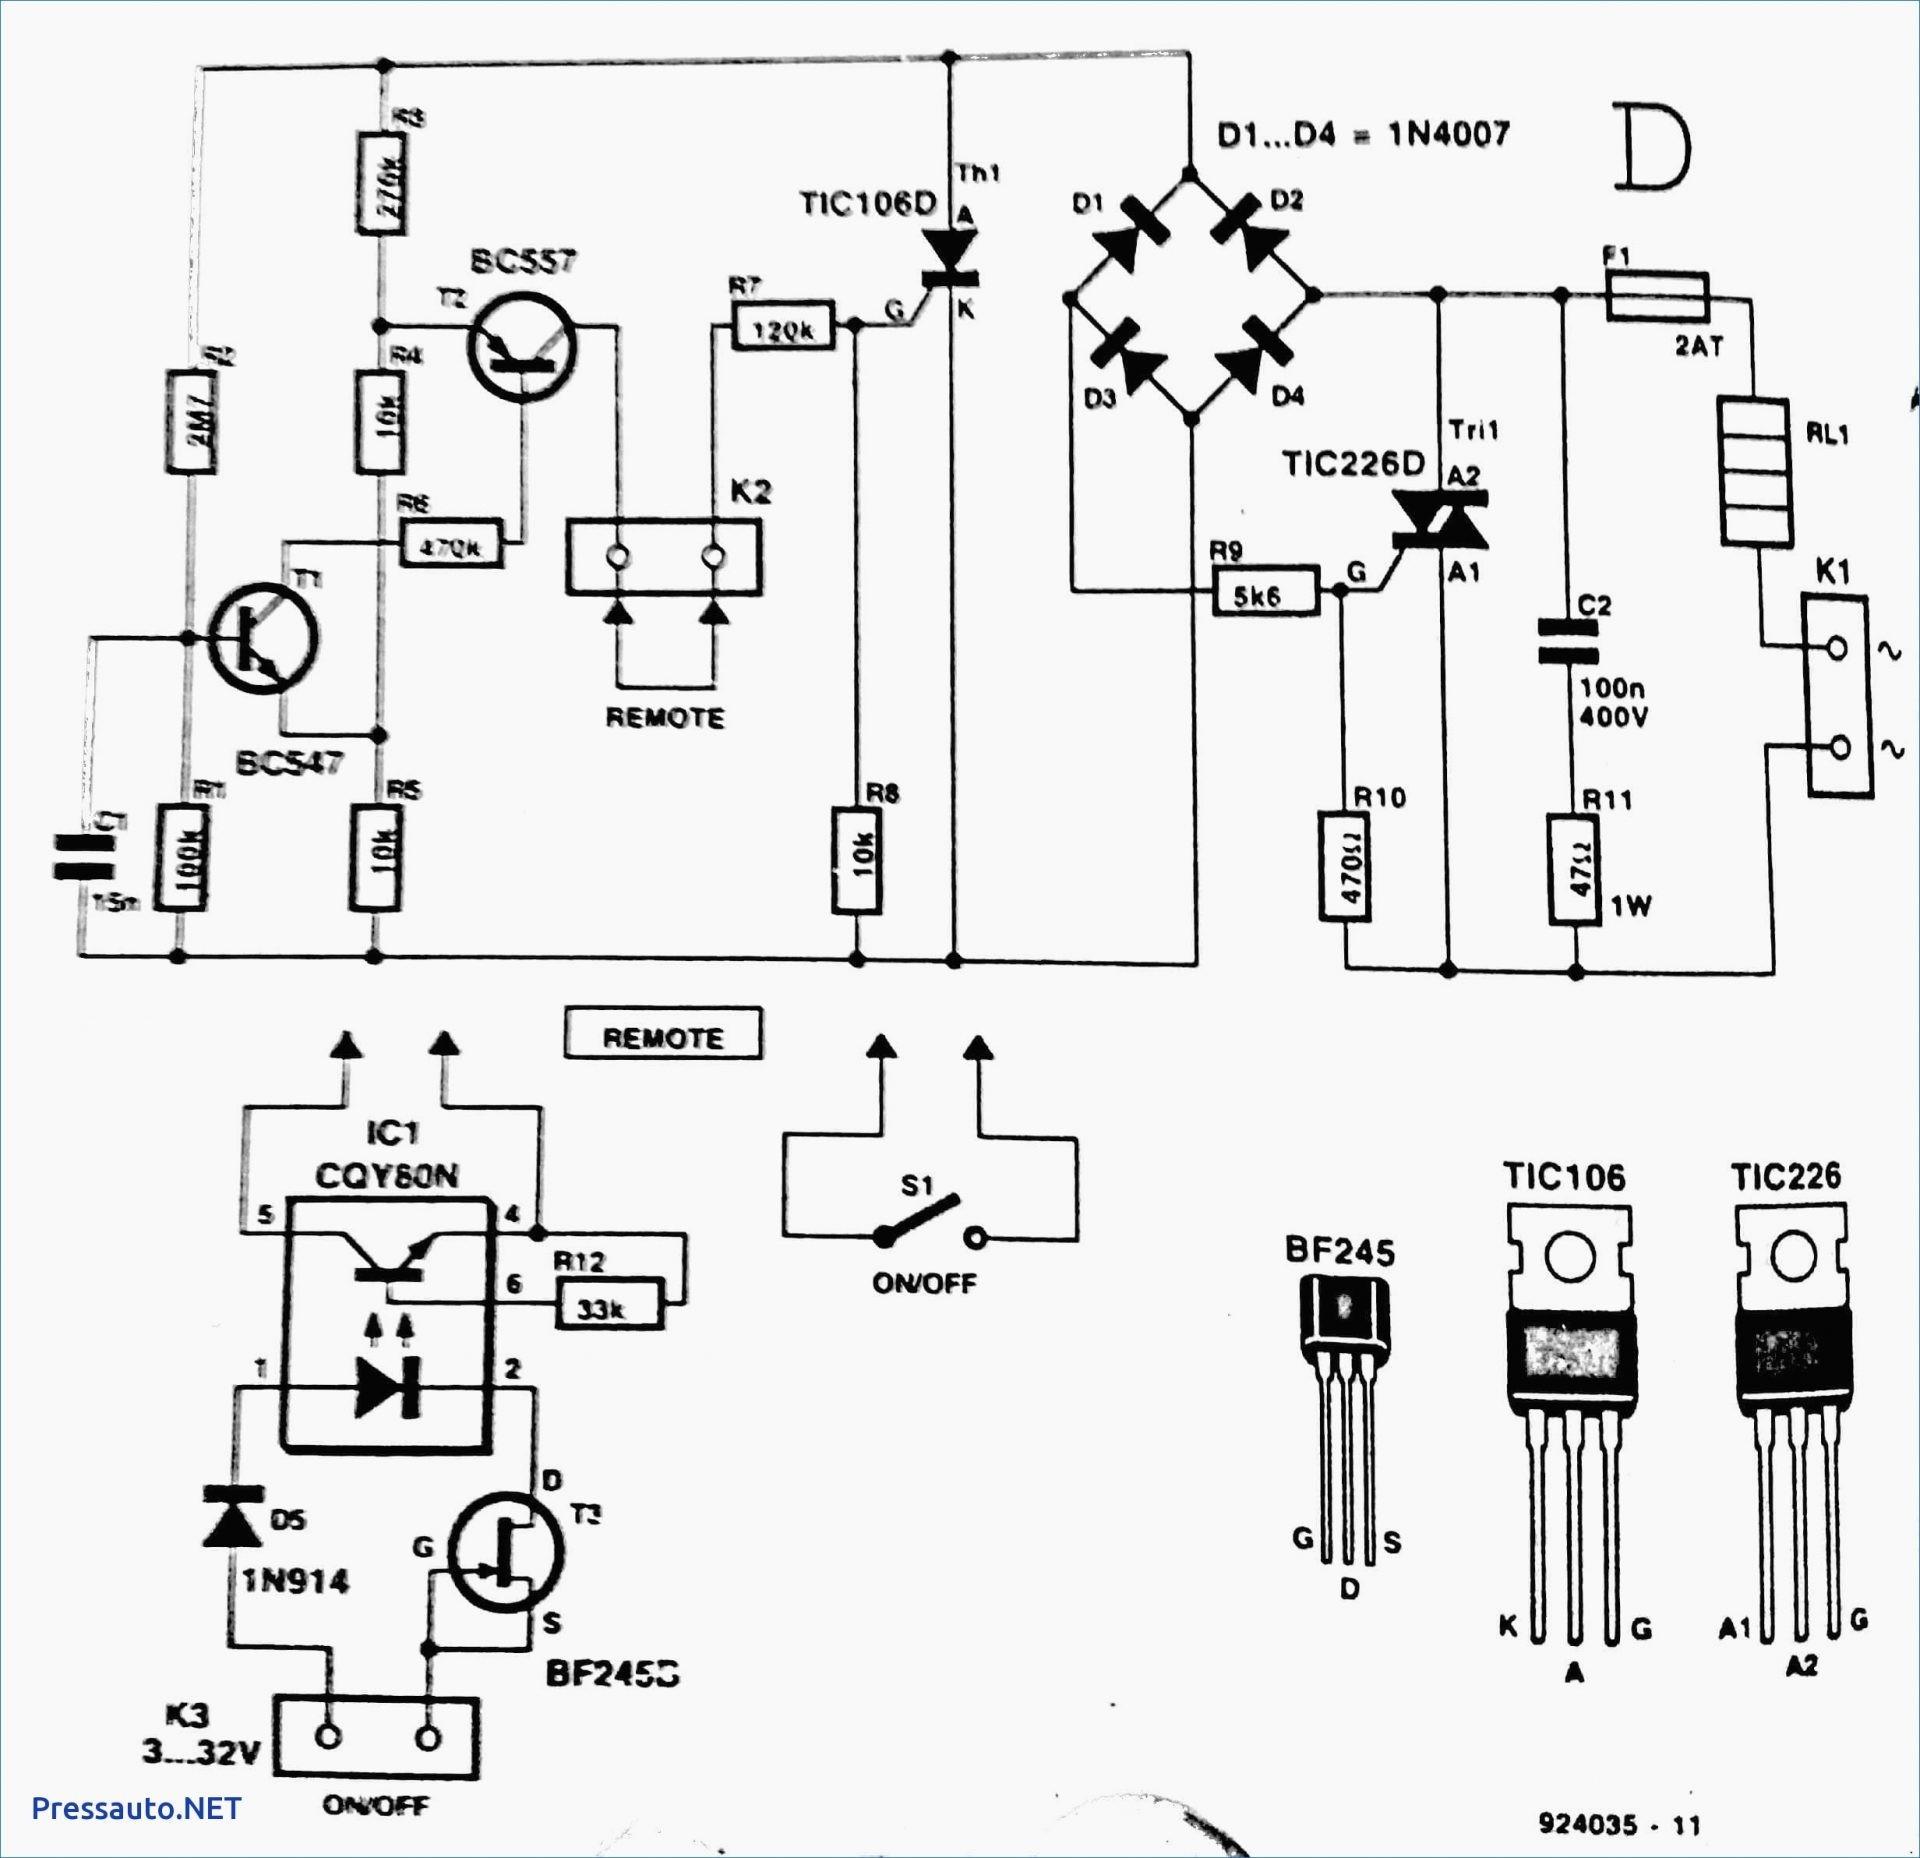 Leviton Dimmer Switch Wiring Diagram Fresh Single Pole ... on